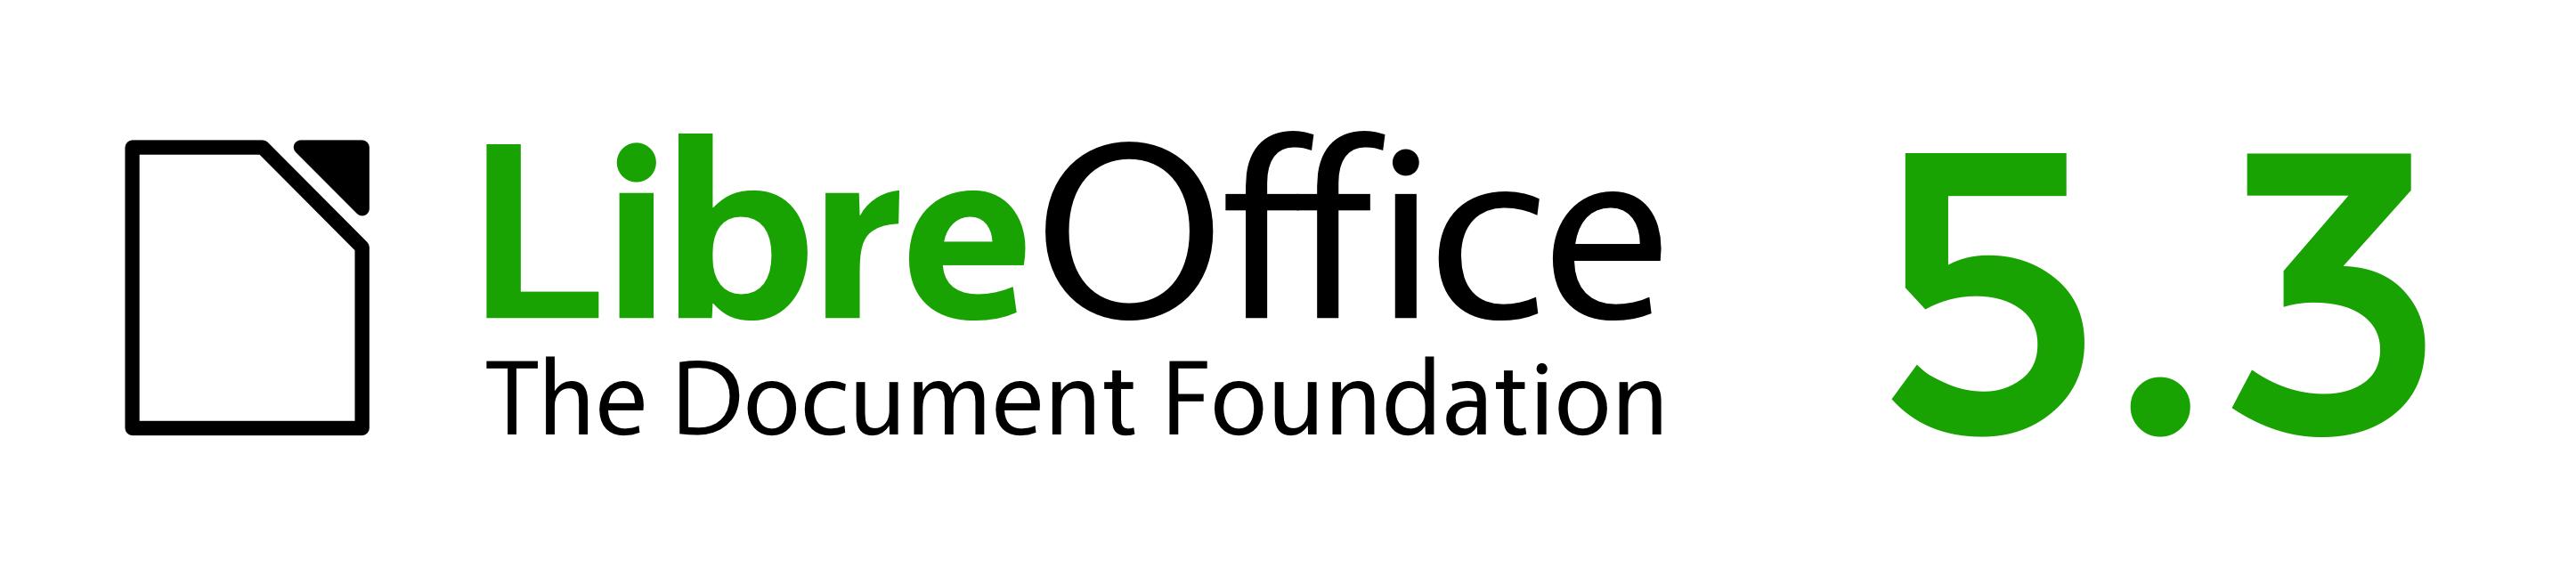 LibreOffice 5.3 logó